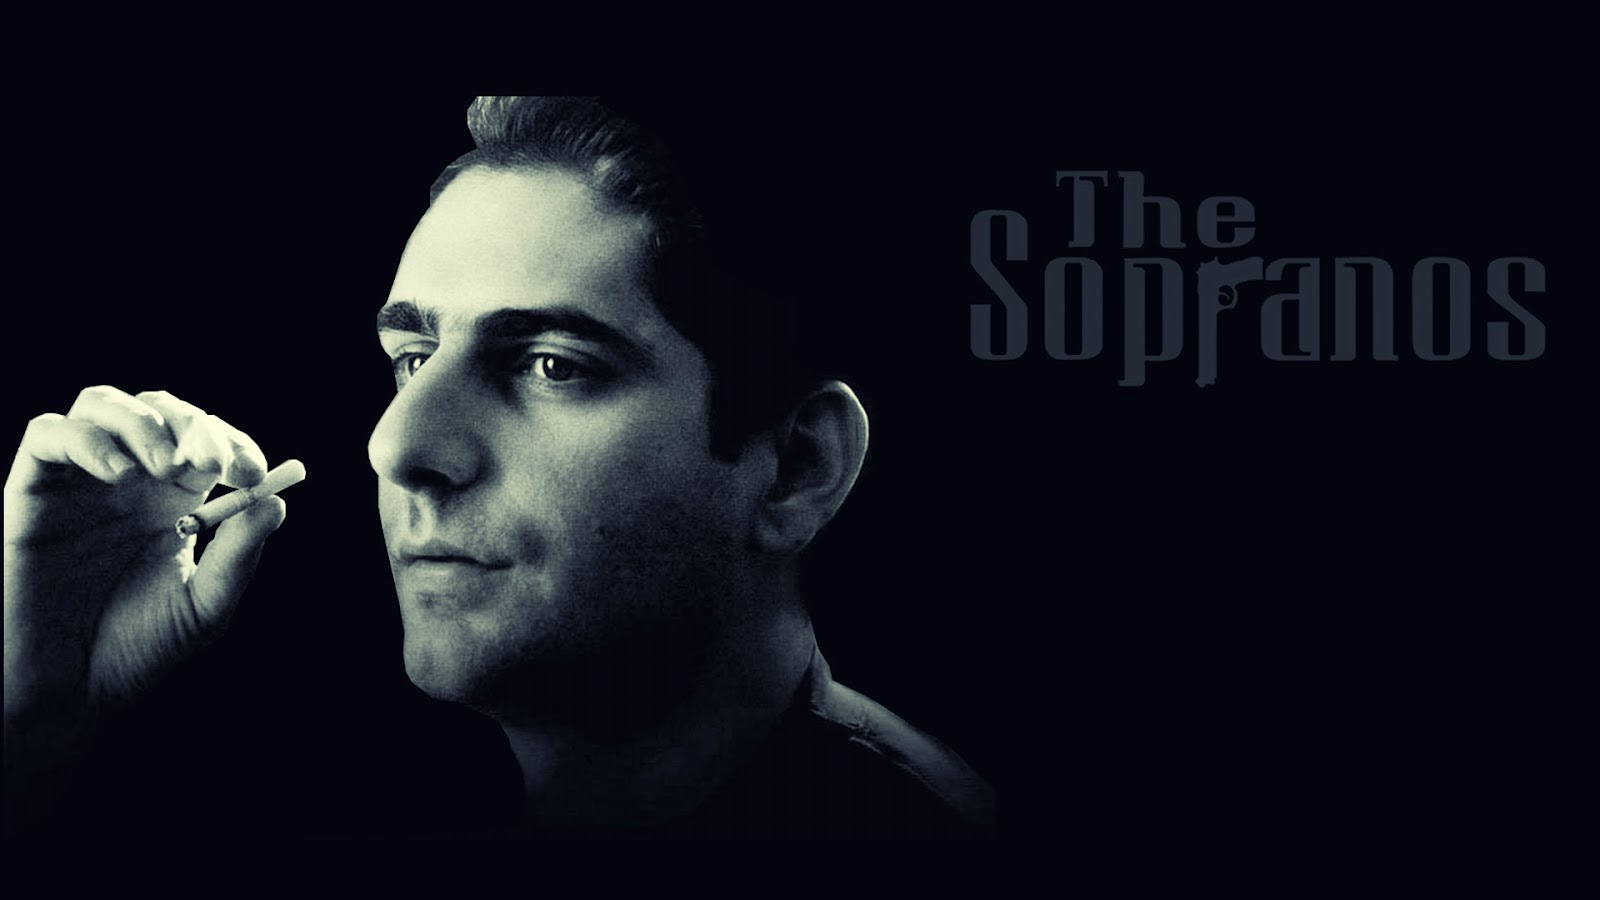 OneLife Posts: |photos| The Sopranos